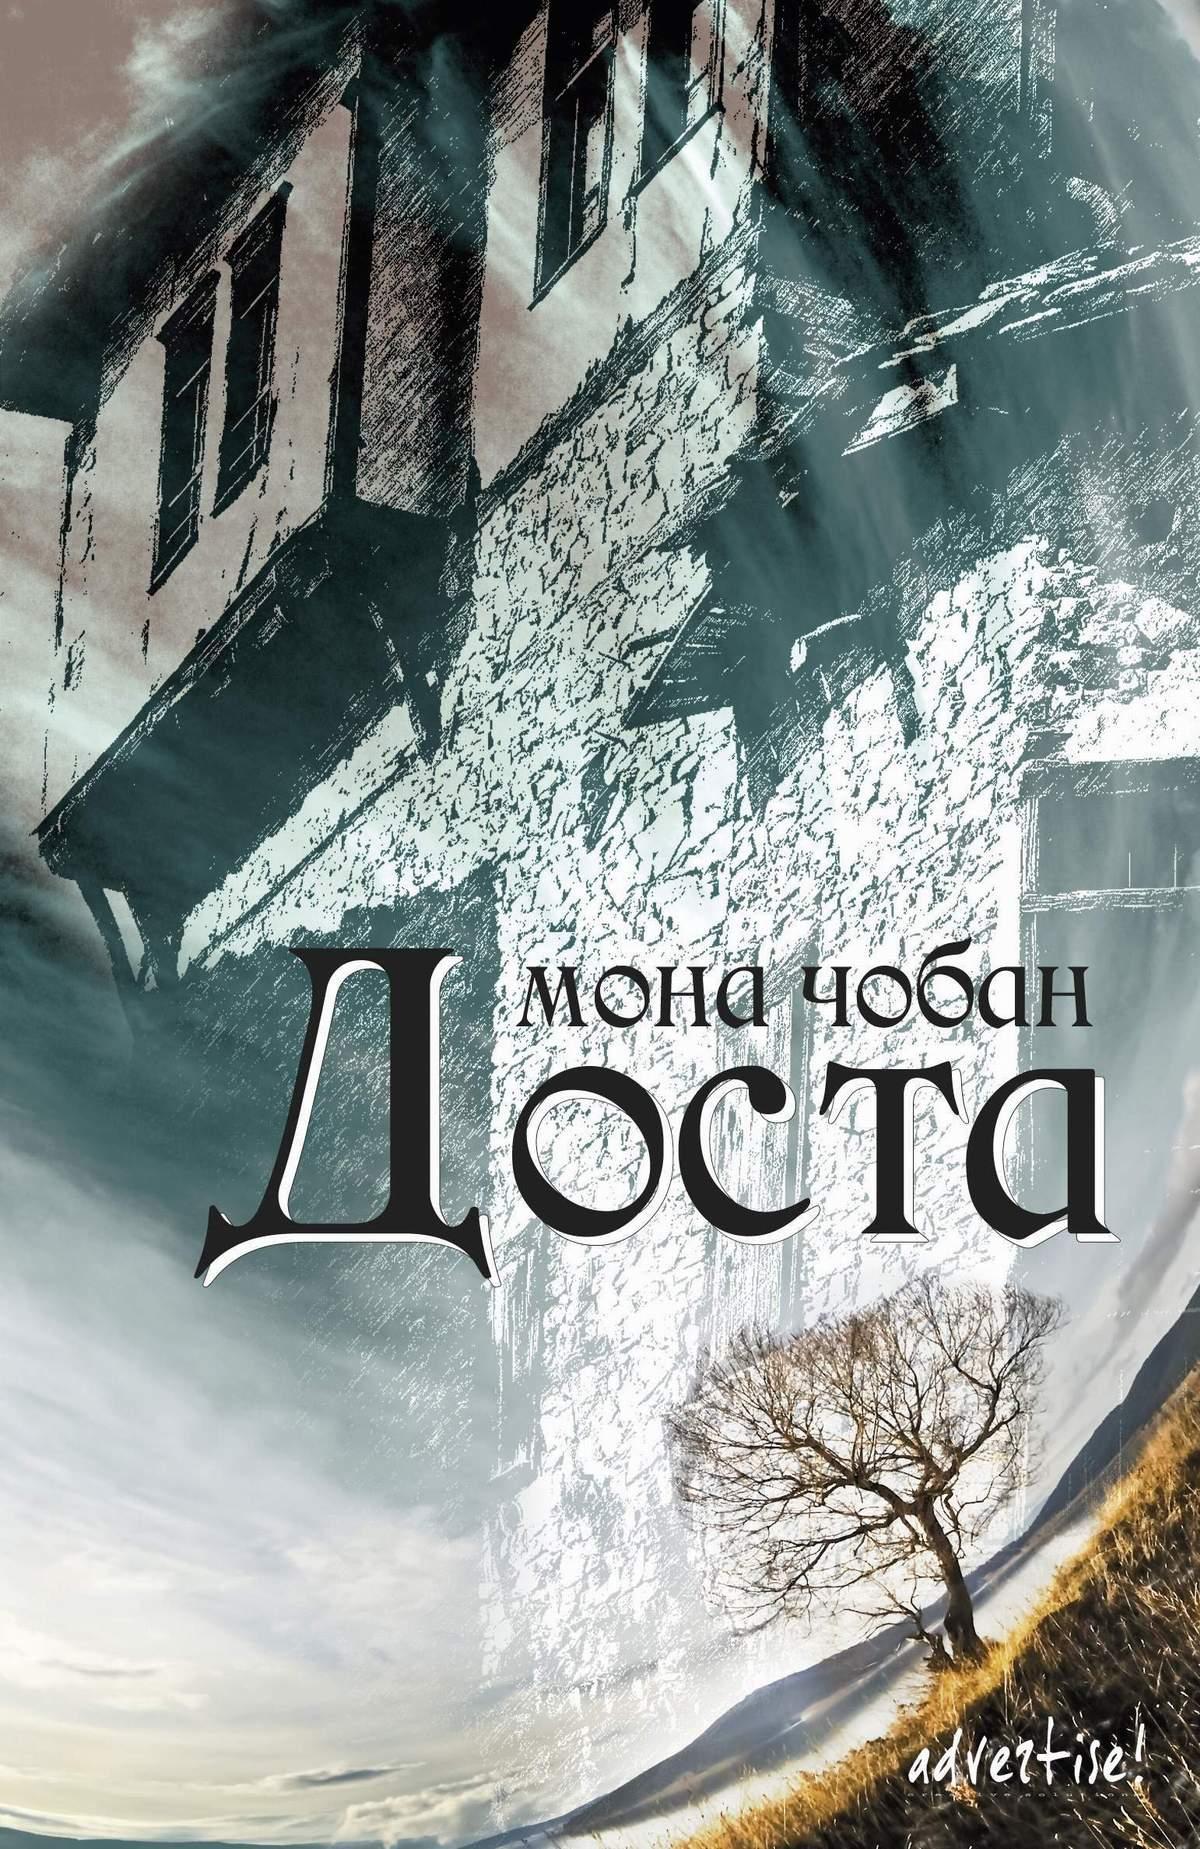 mona_4oban_roman_Dosta